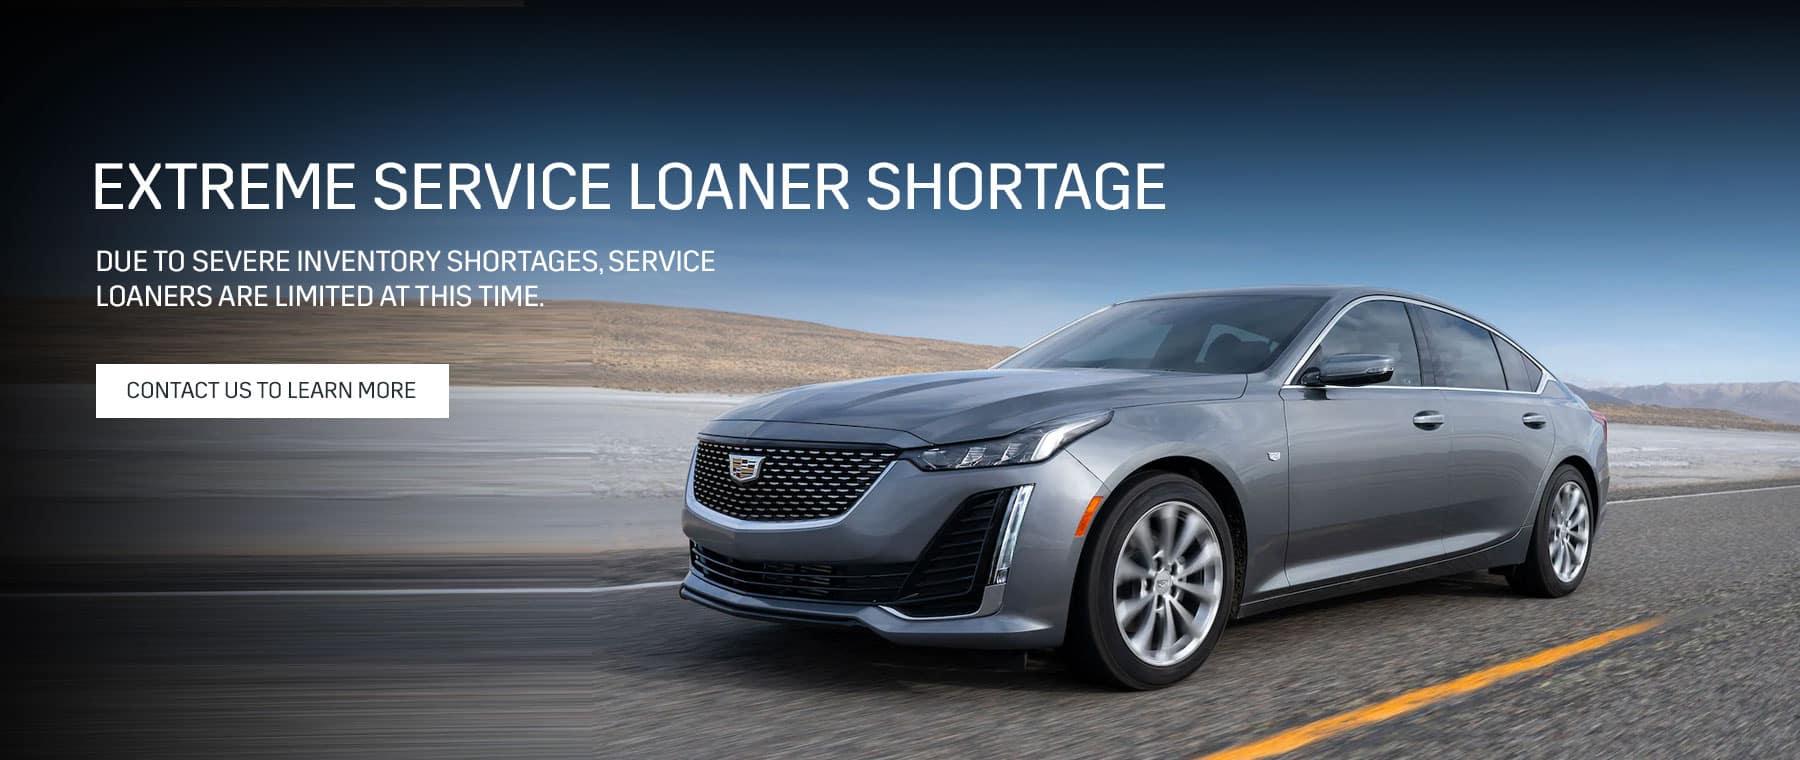 extreme service loaner shortage